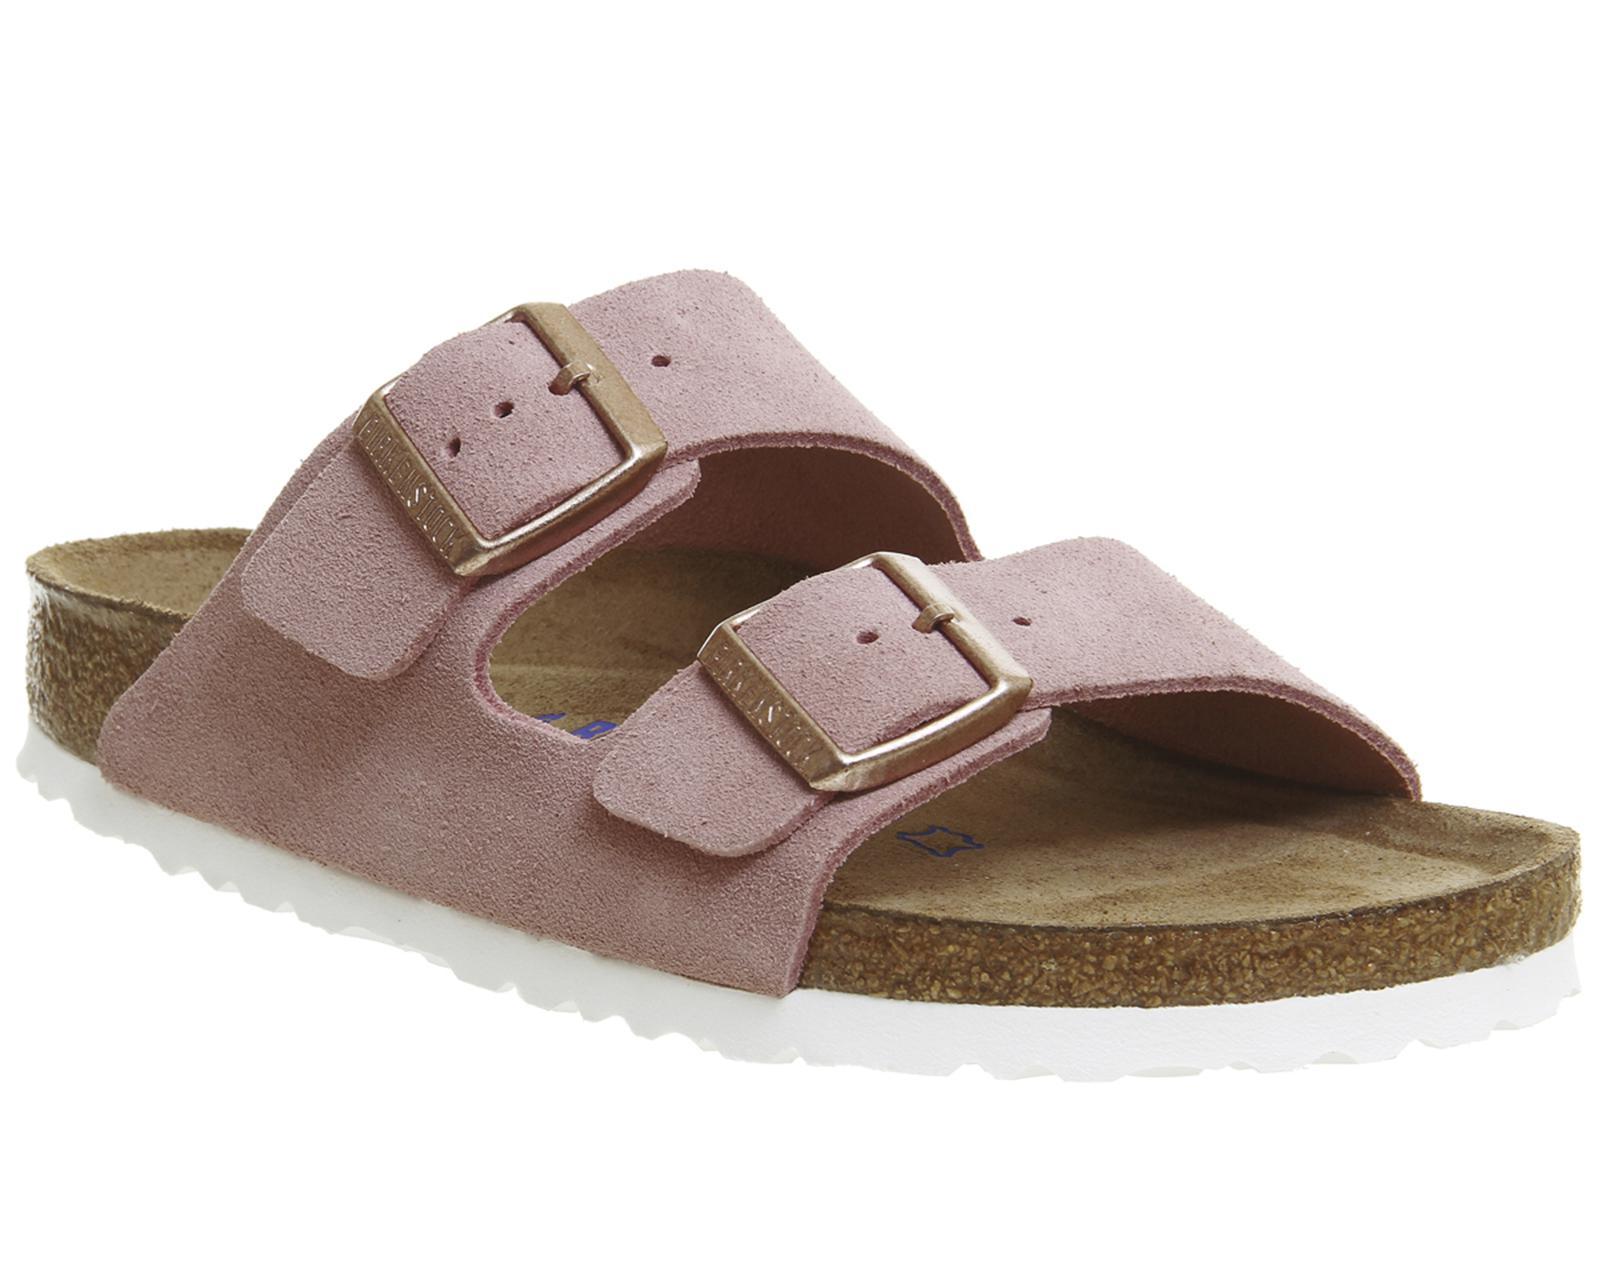 Lyst Birkenstock Arizona Two Strap Sandals In Pink